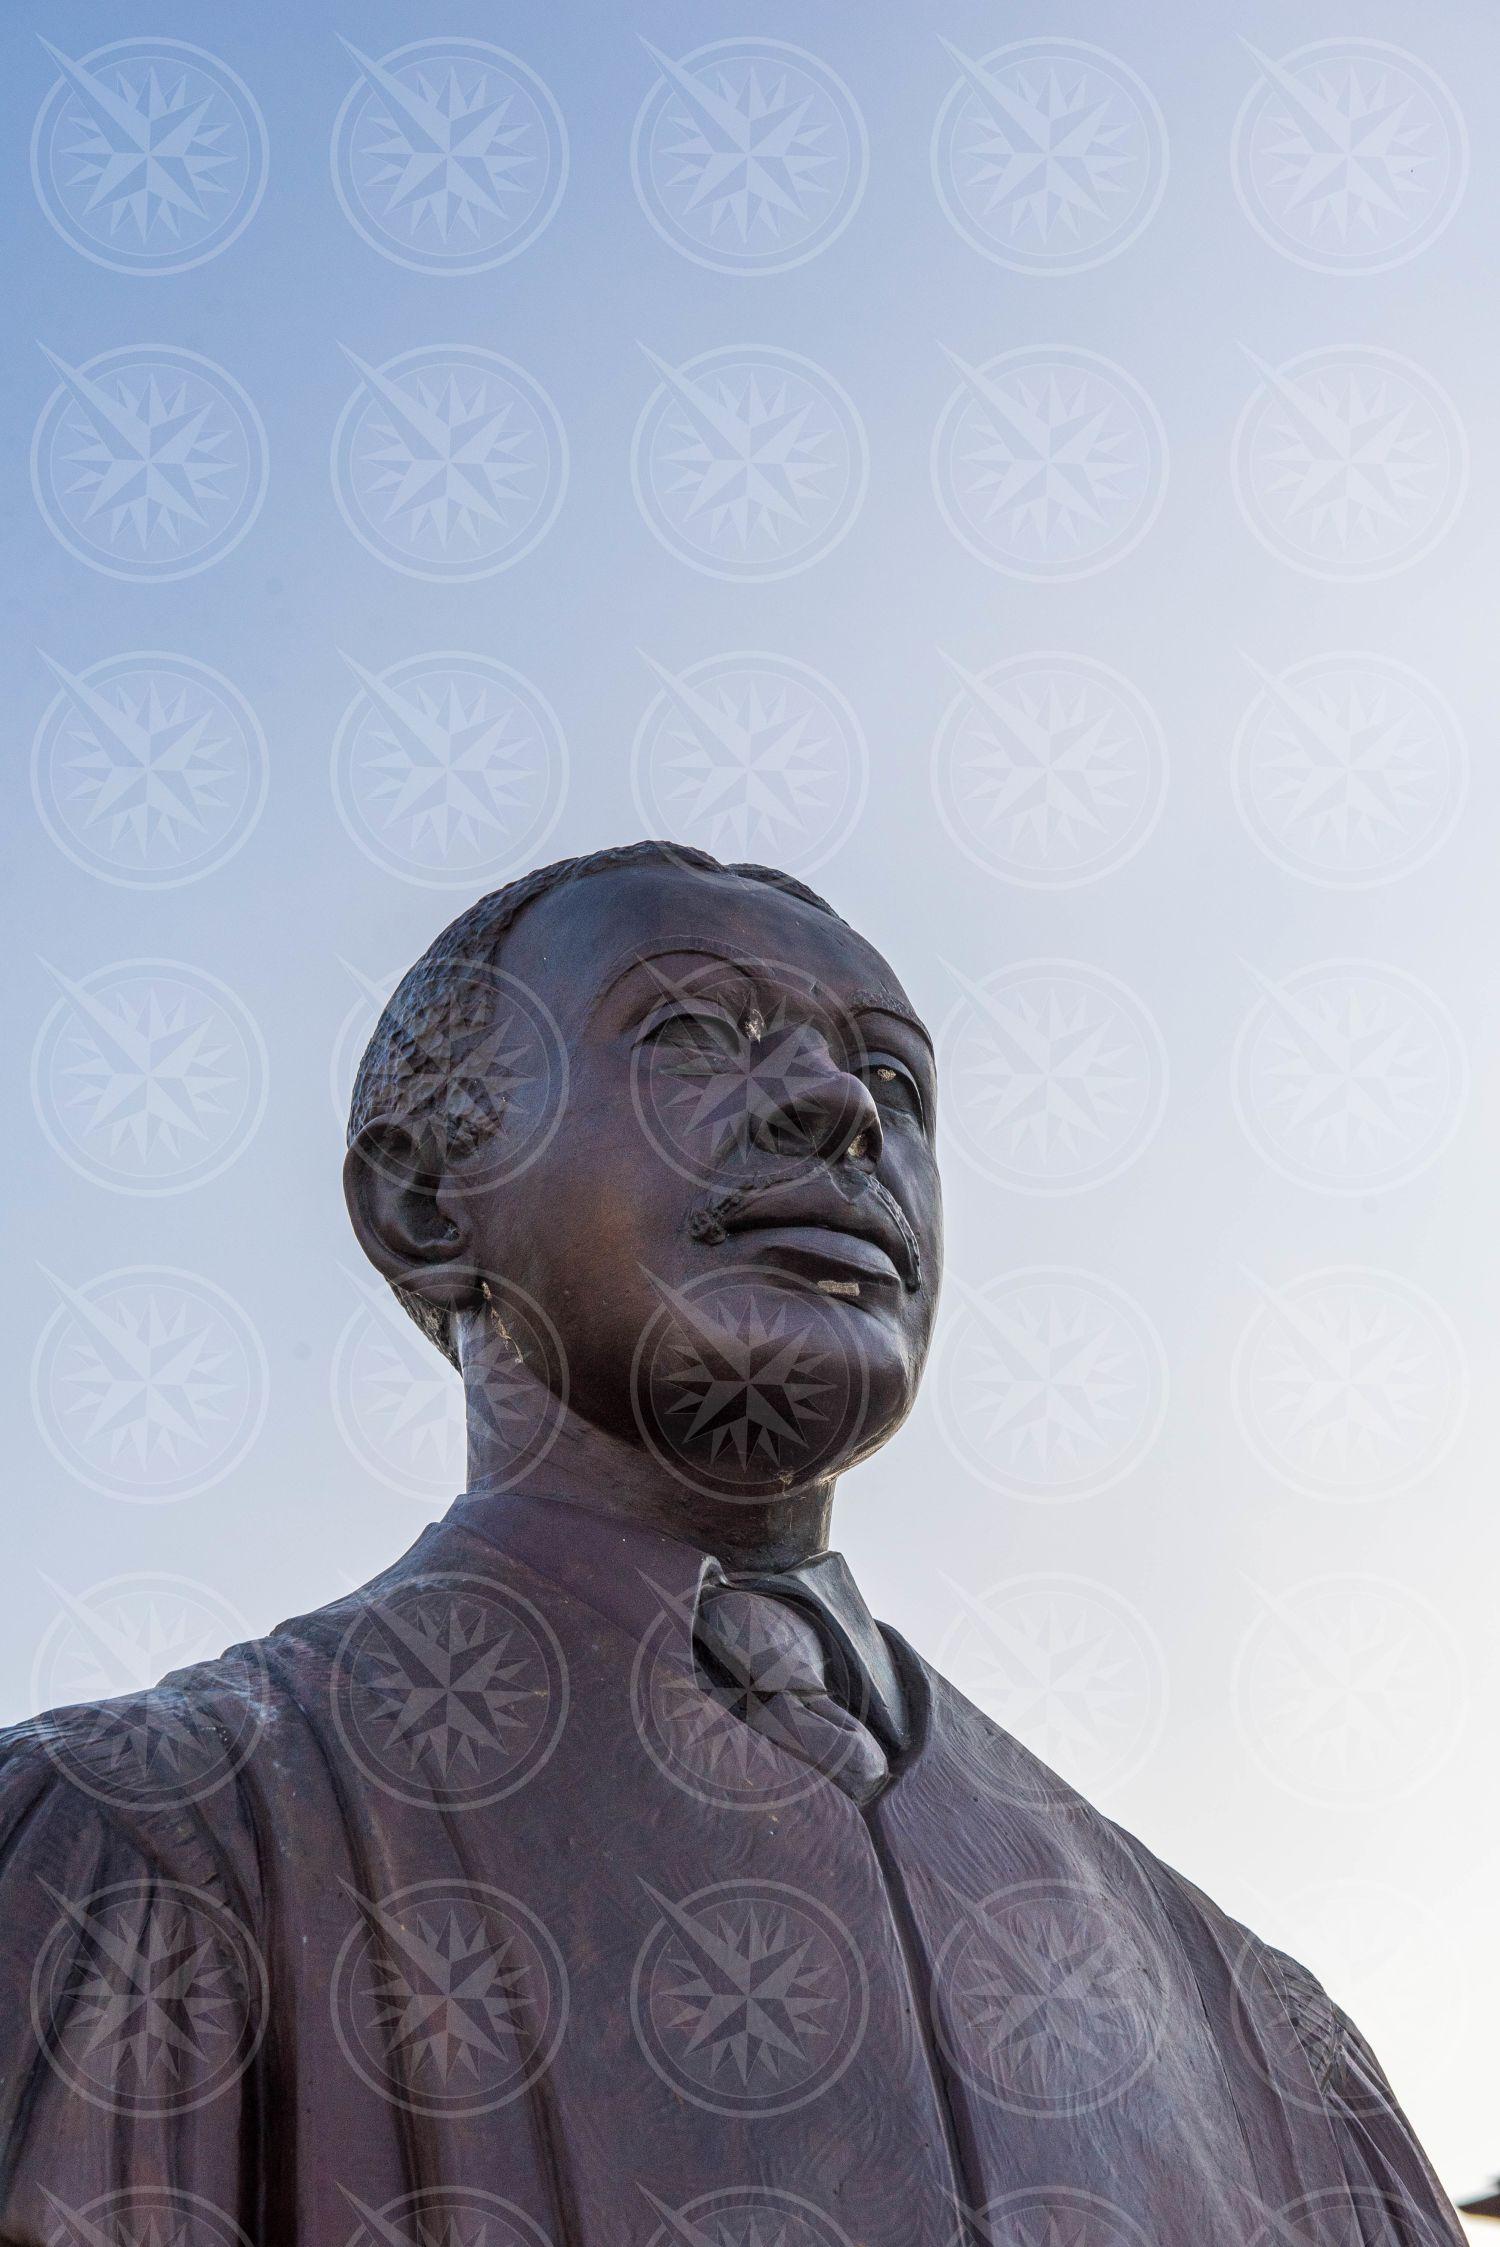 David Hamilton Jackson Statue at Christiansted National Historic Site